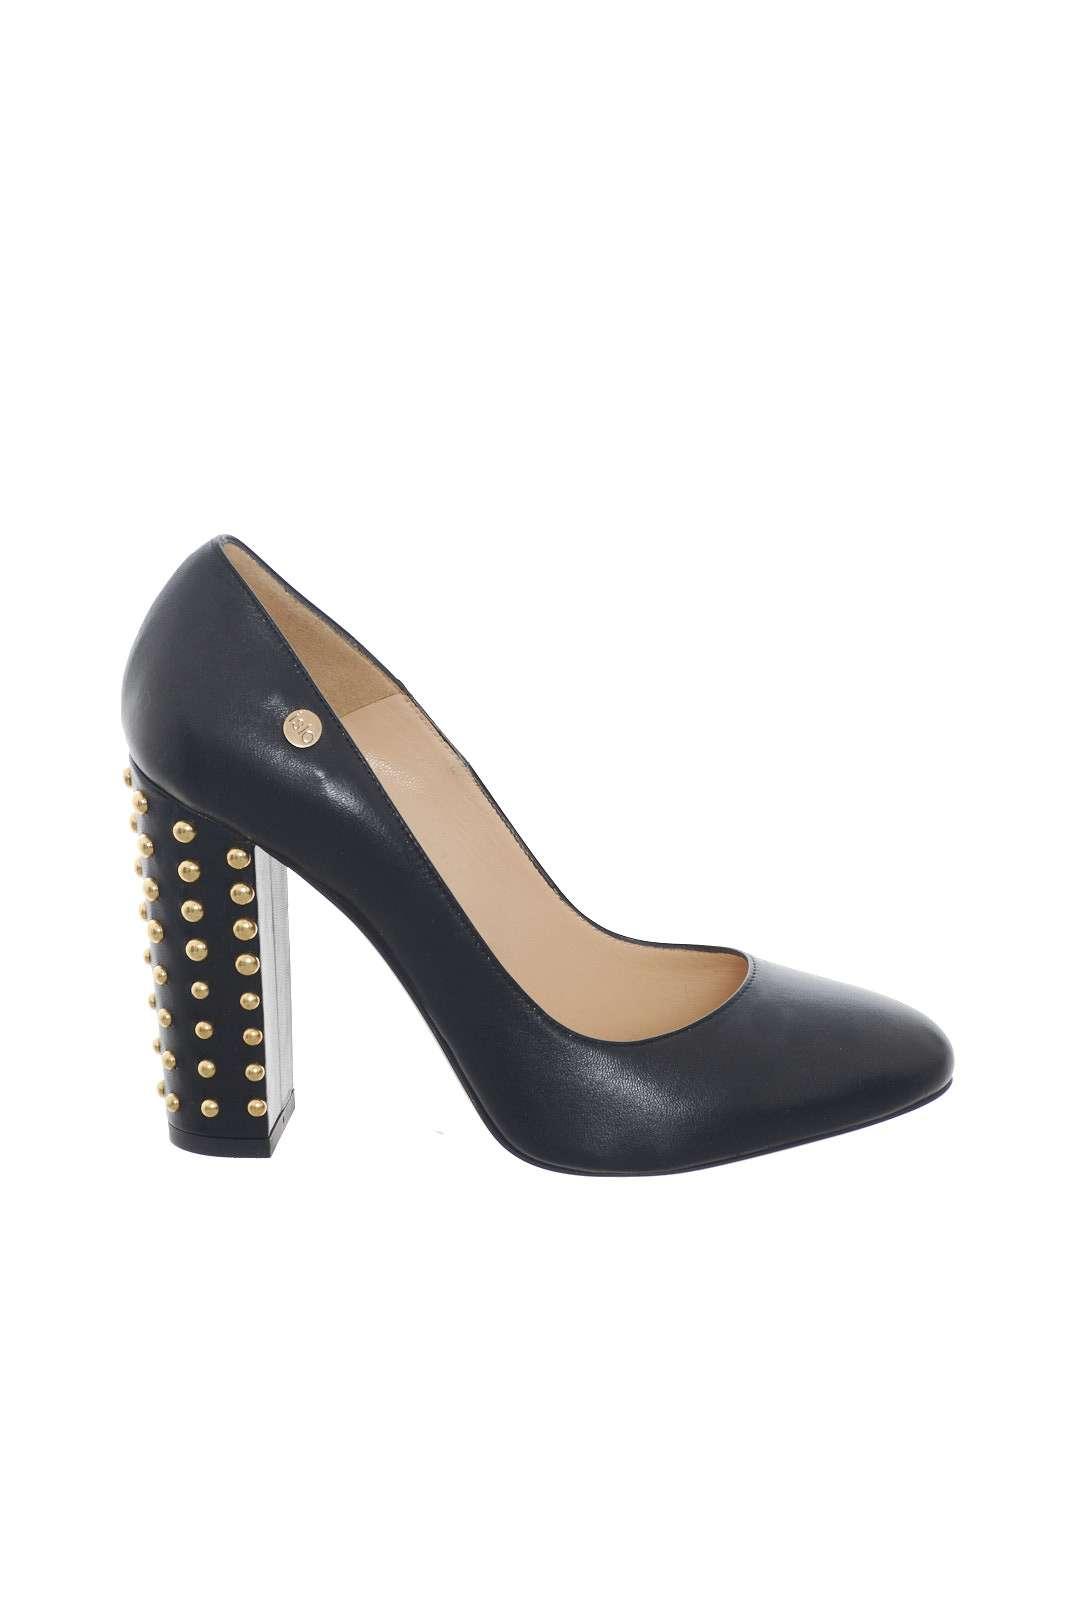 https://www.parmax.com/media/catalog/product/a/i/AI-outlet_parmax-scarpe-donna-isabella-Lorusso-CELIA-A_1.jpg